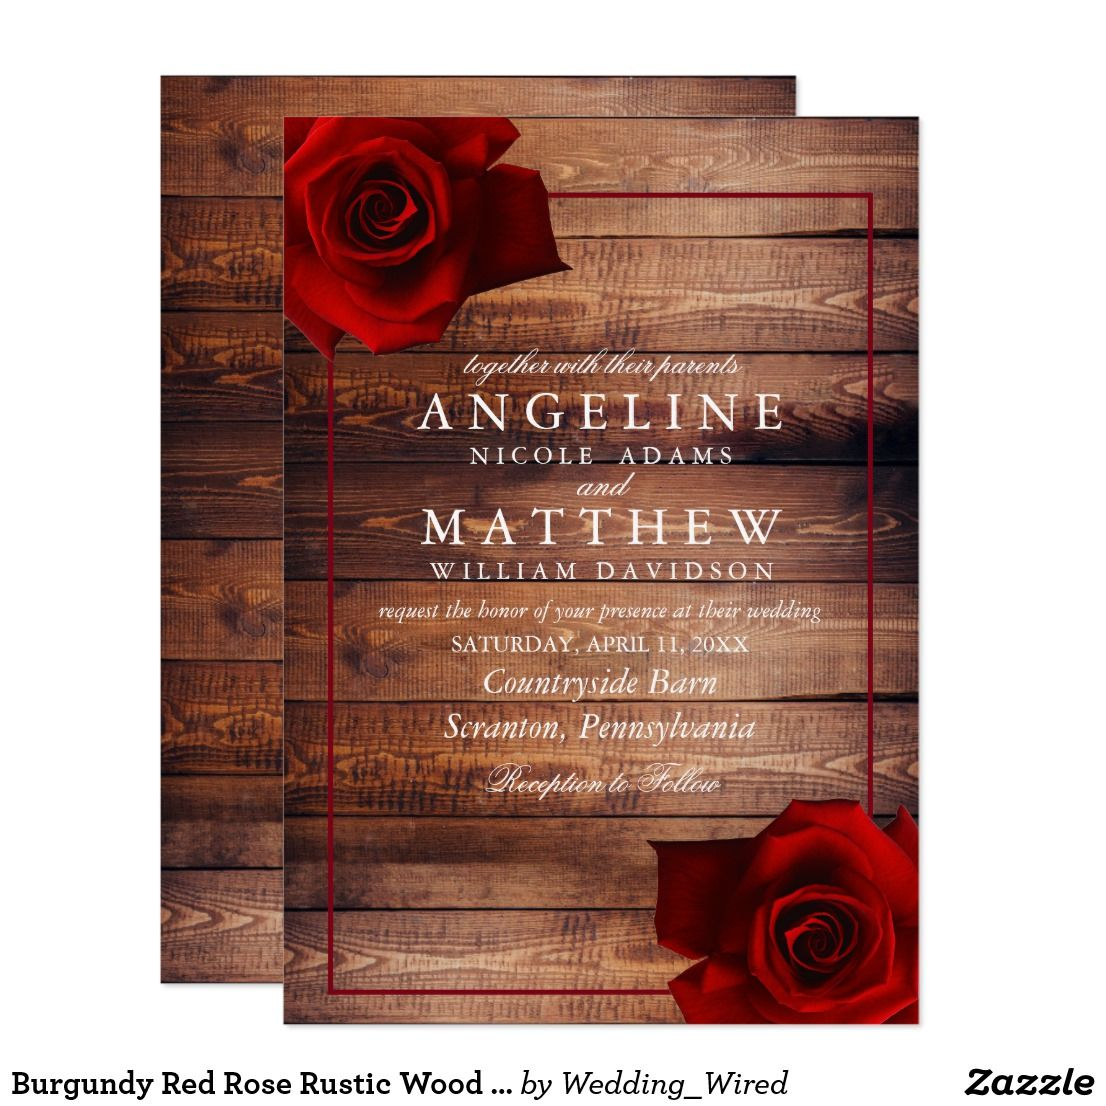 Burgundy Red Rose Rustic Wood Wedding Invitation Zazzle